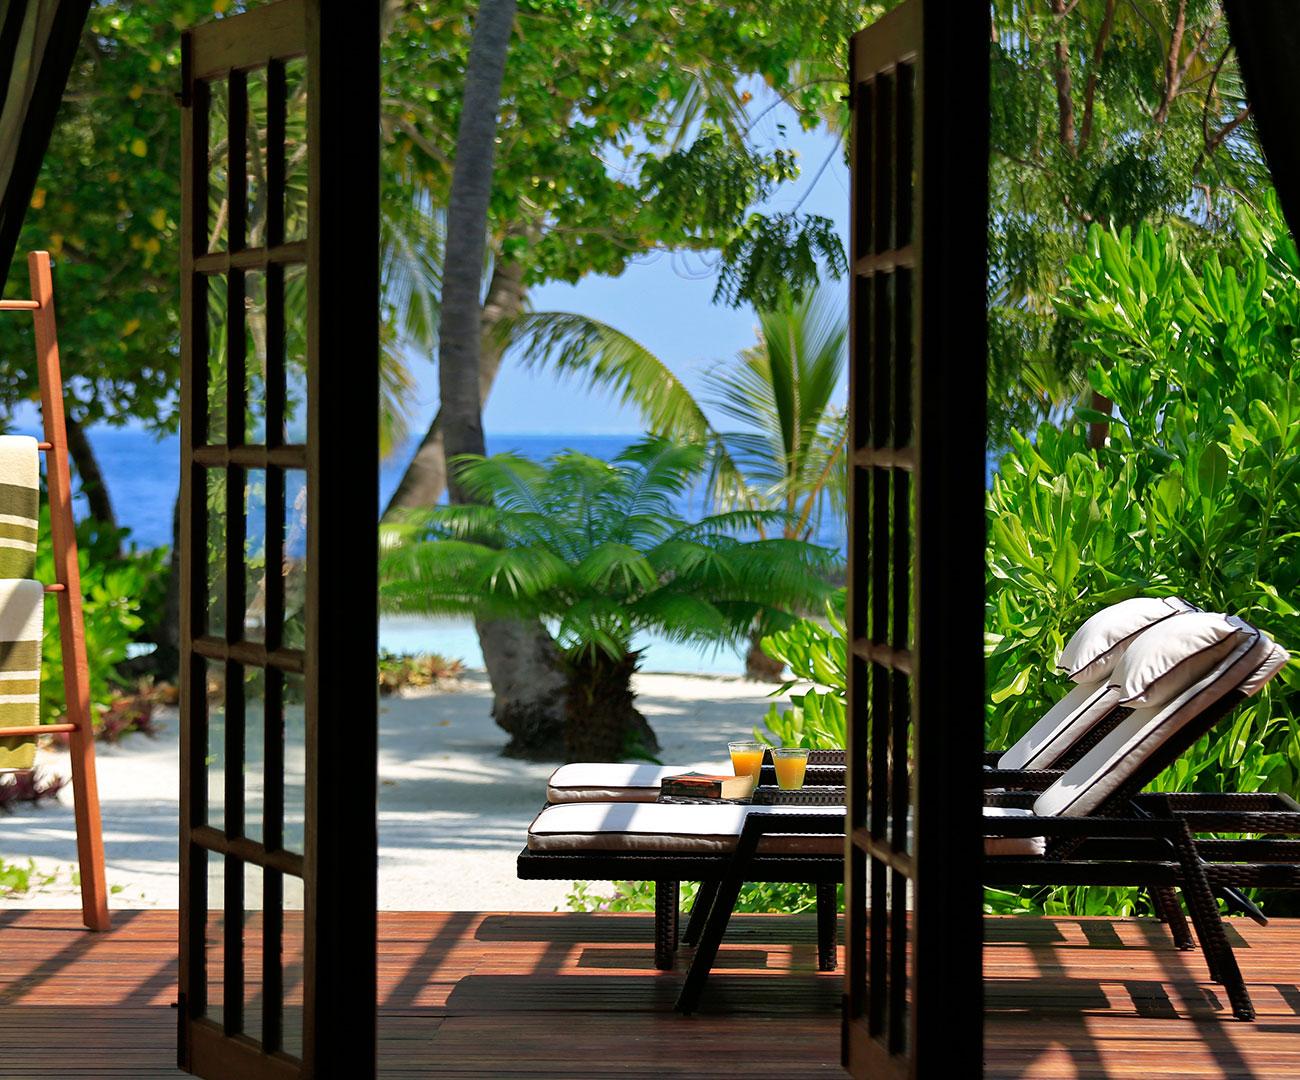 Kurumba Maldives - Presidential Pool Villa - Balcony View Image - Maldives Resorts